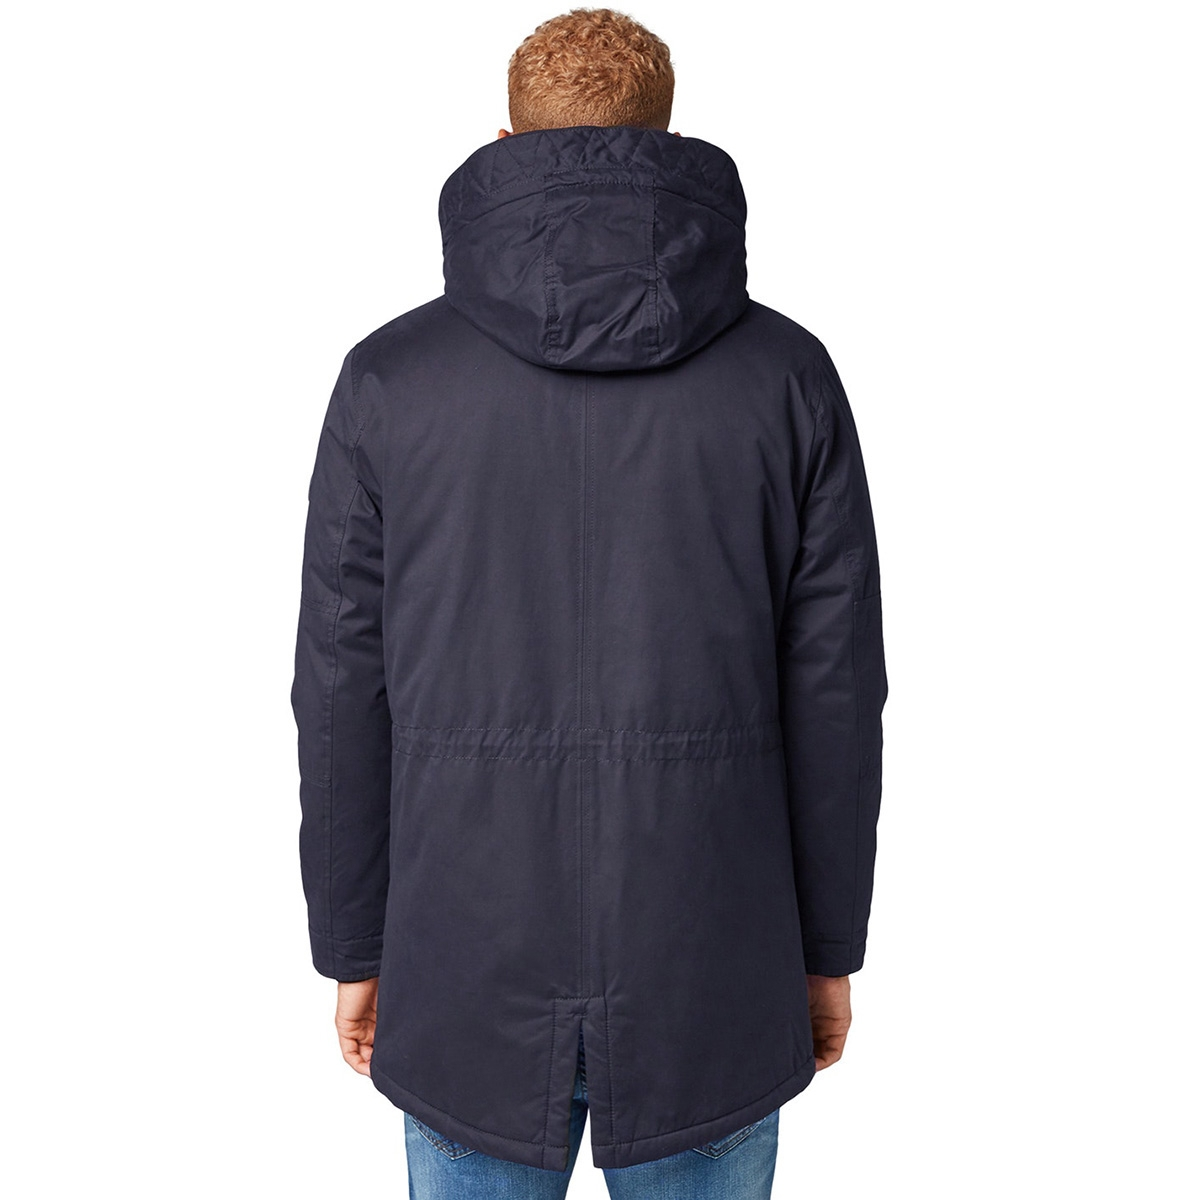 parka met capuchon 1012016xx12 tom tailor jas 10668